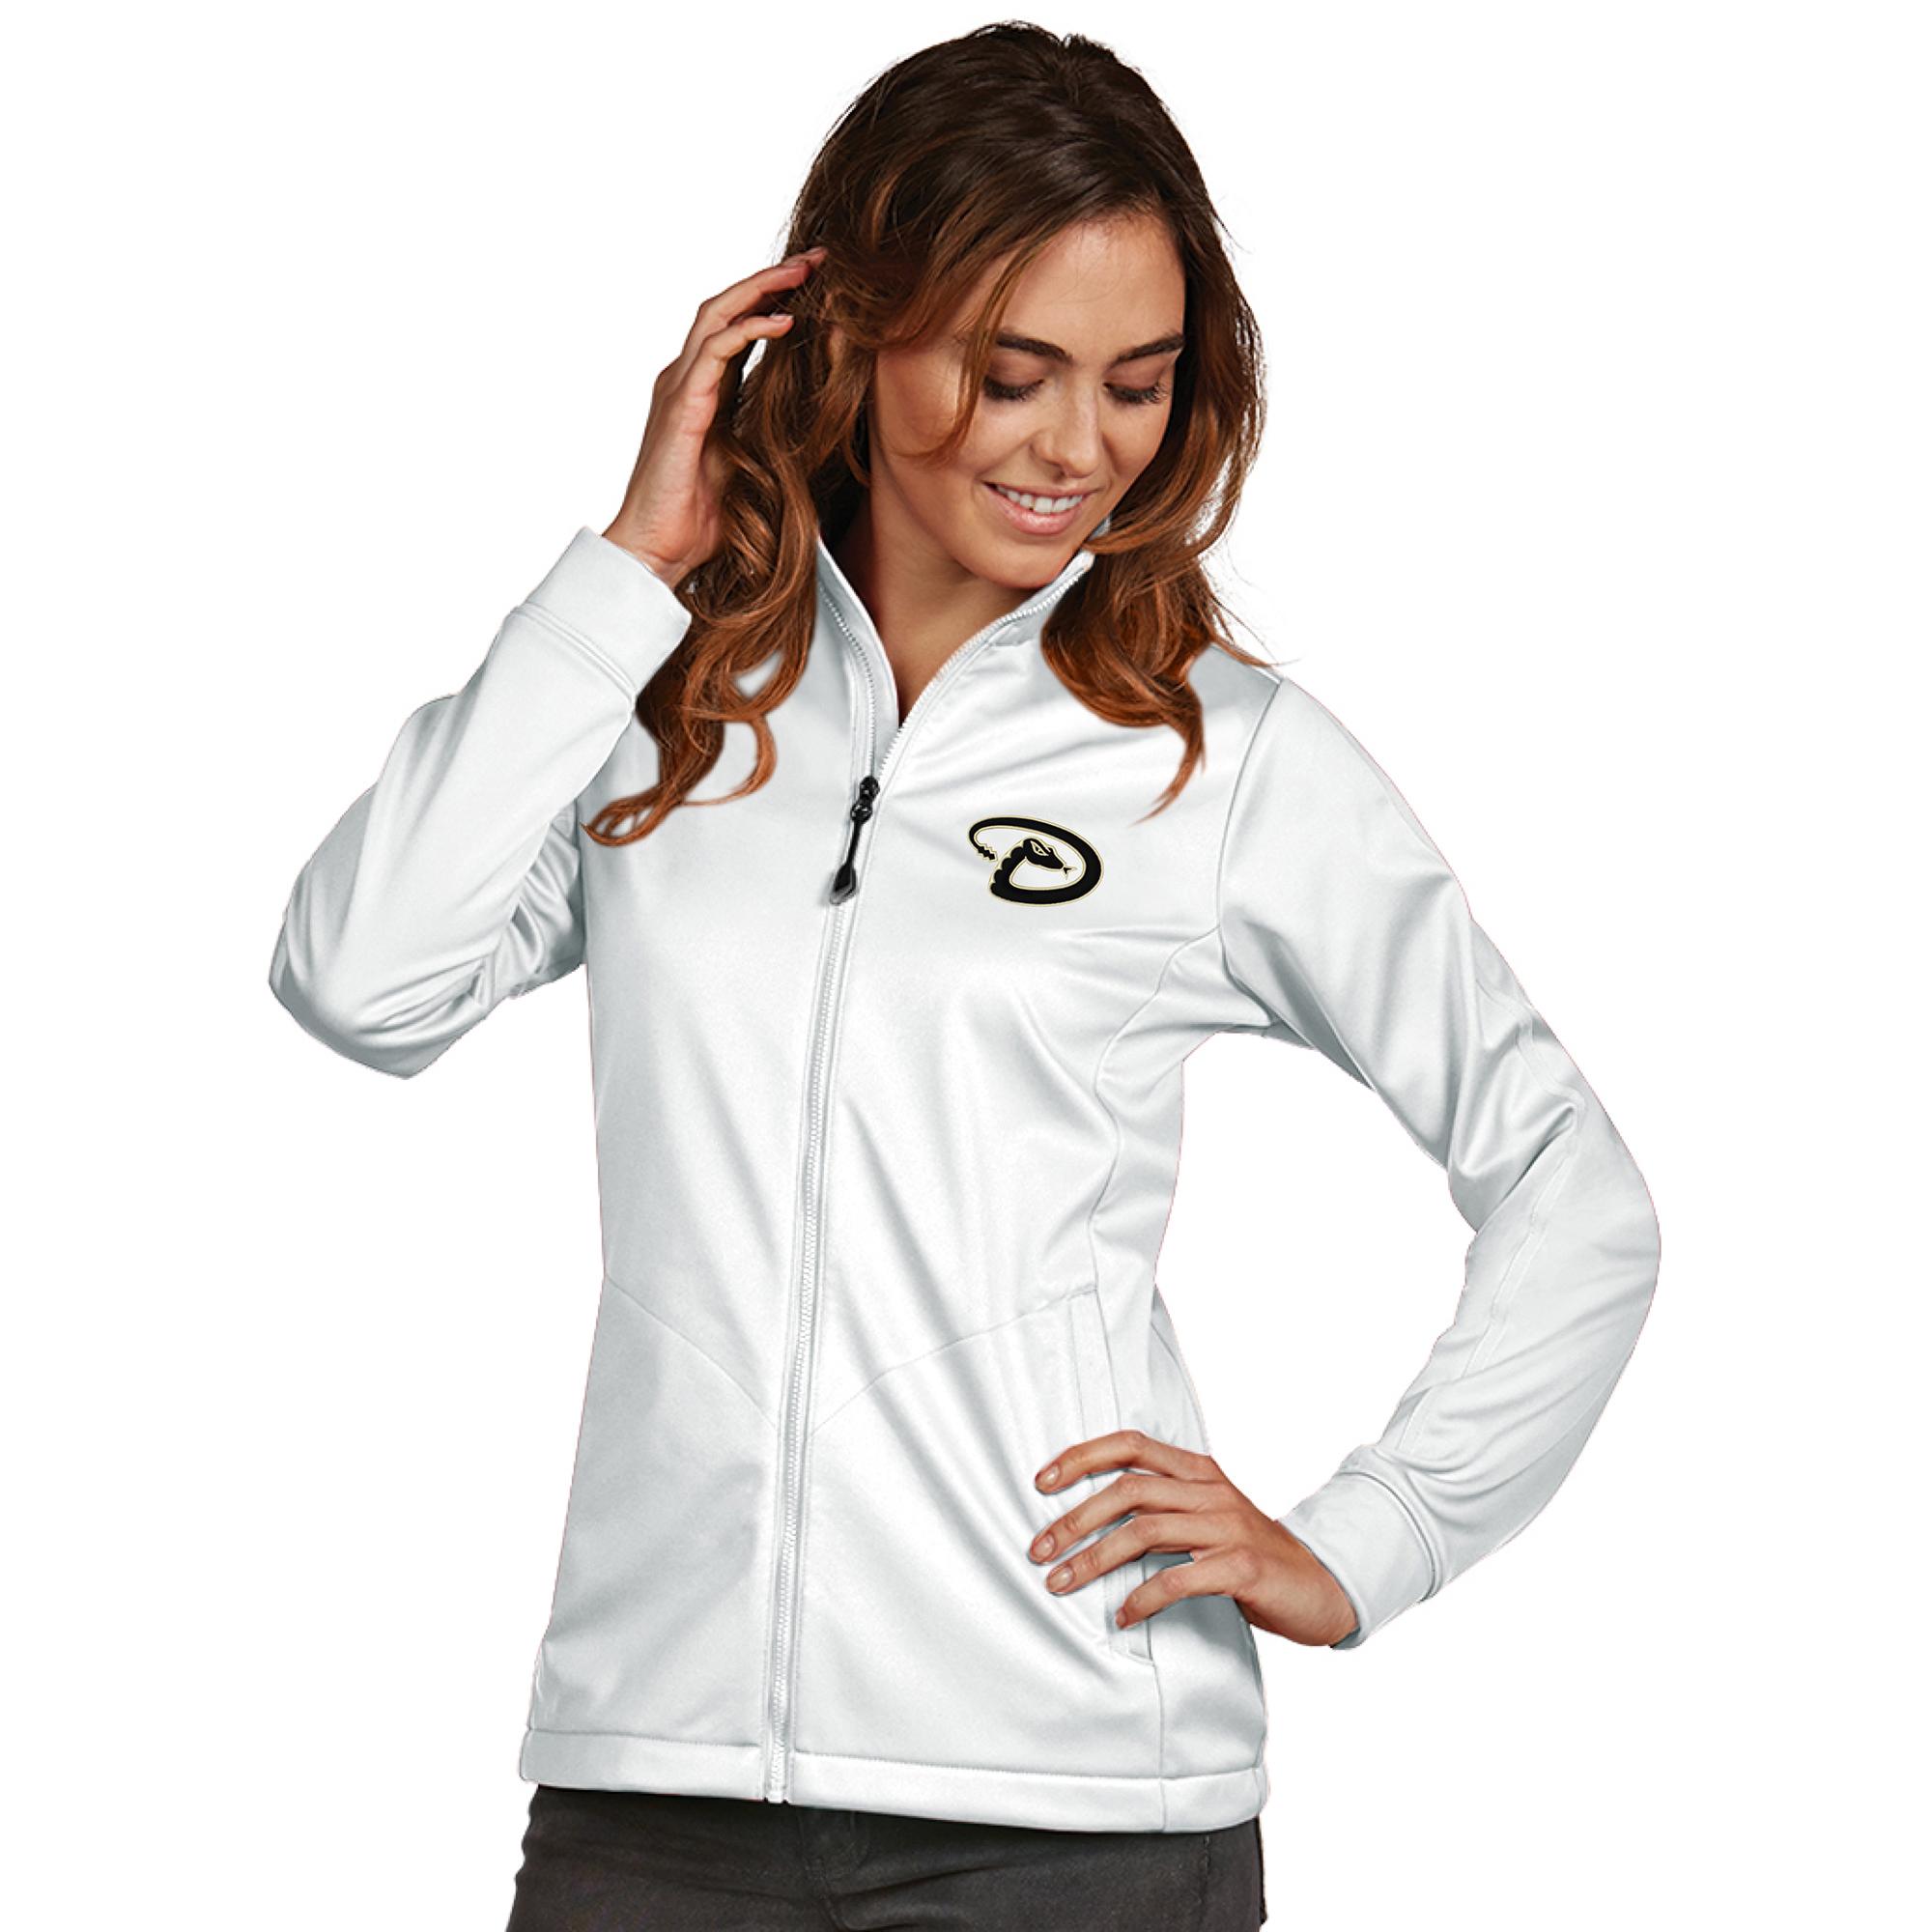 Arizona Diamondbacks Antigua Women's Golf Full-Zip Jacket - White